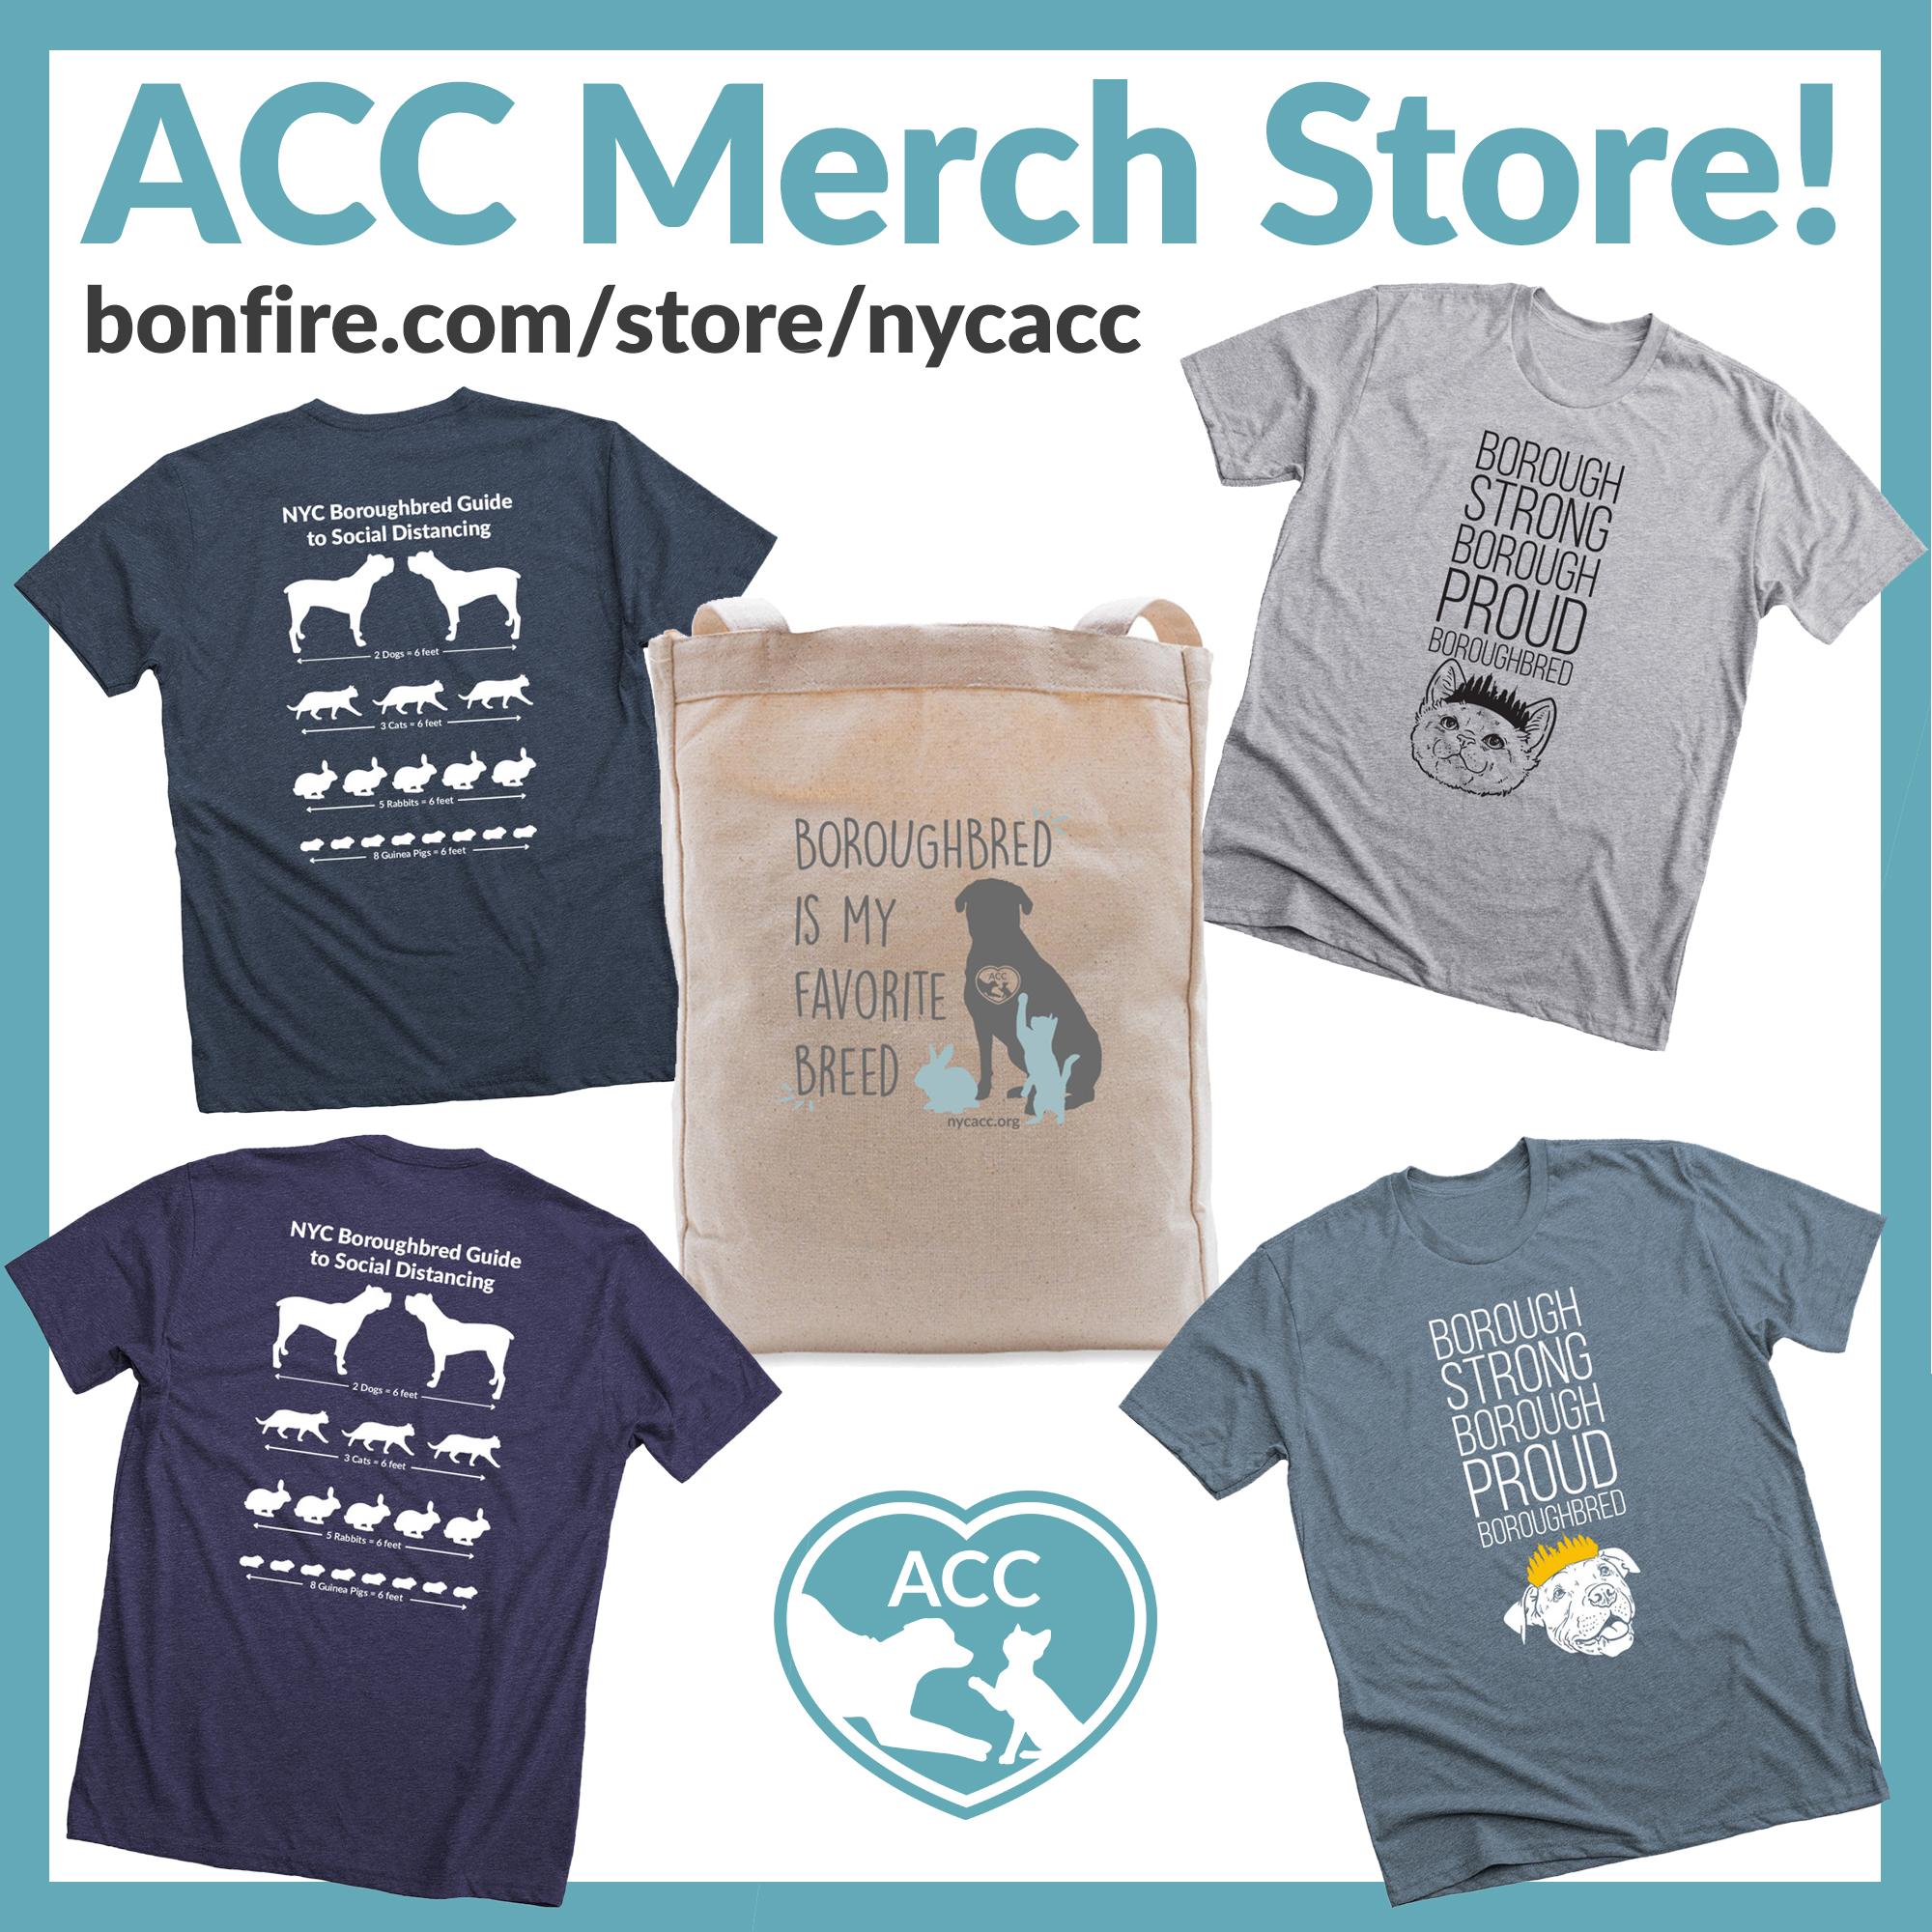 ACC Merch Store